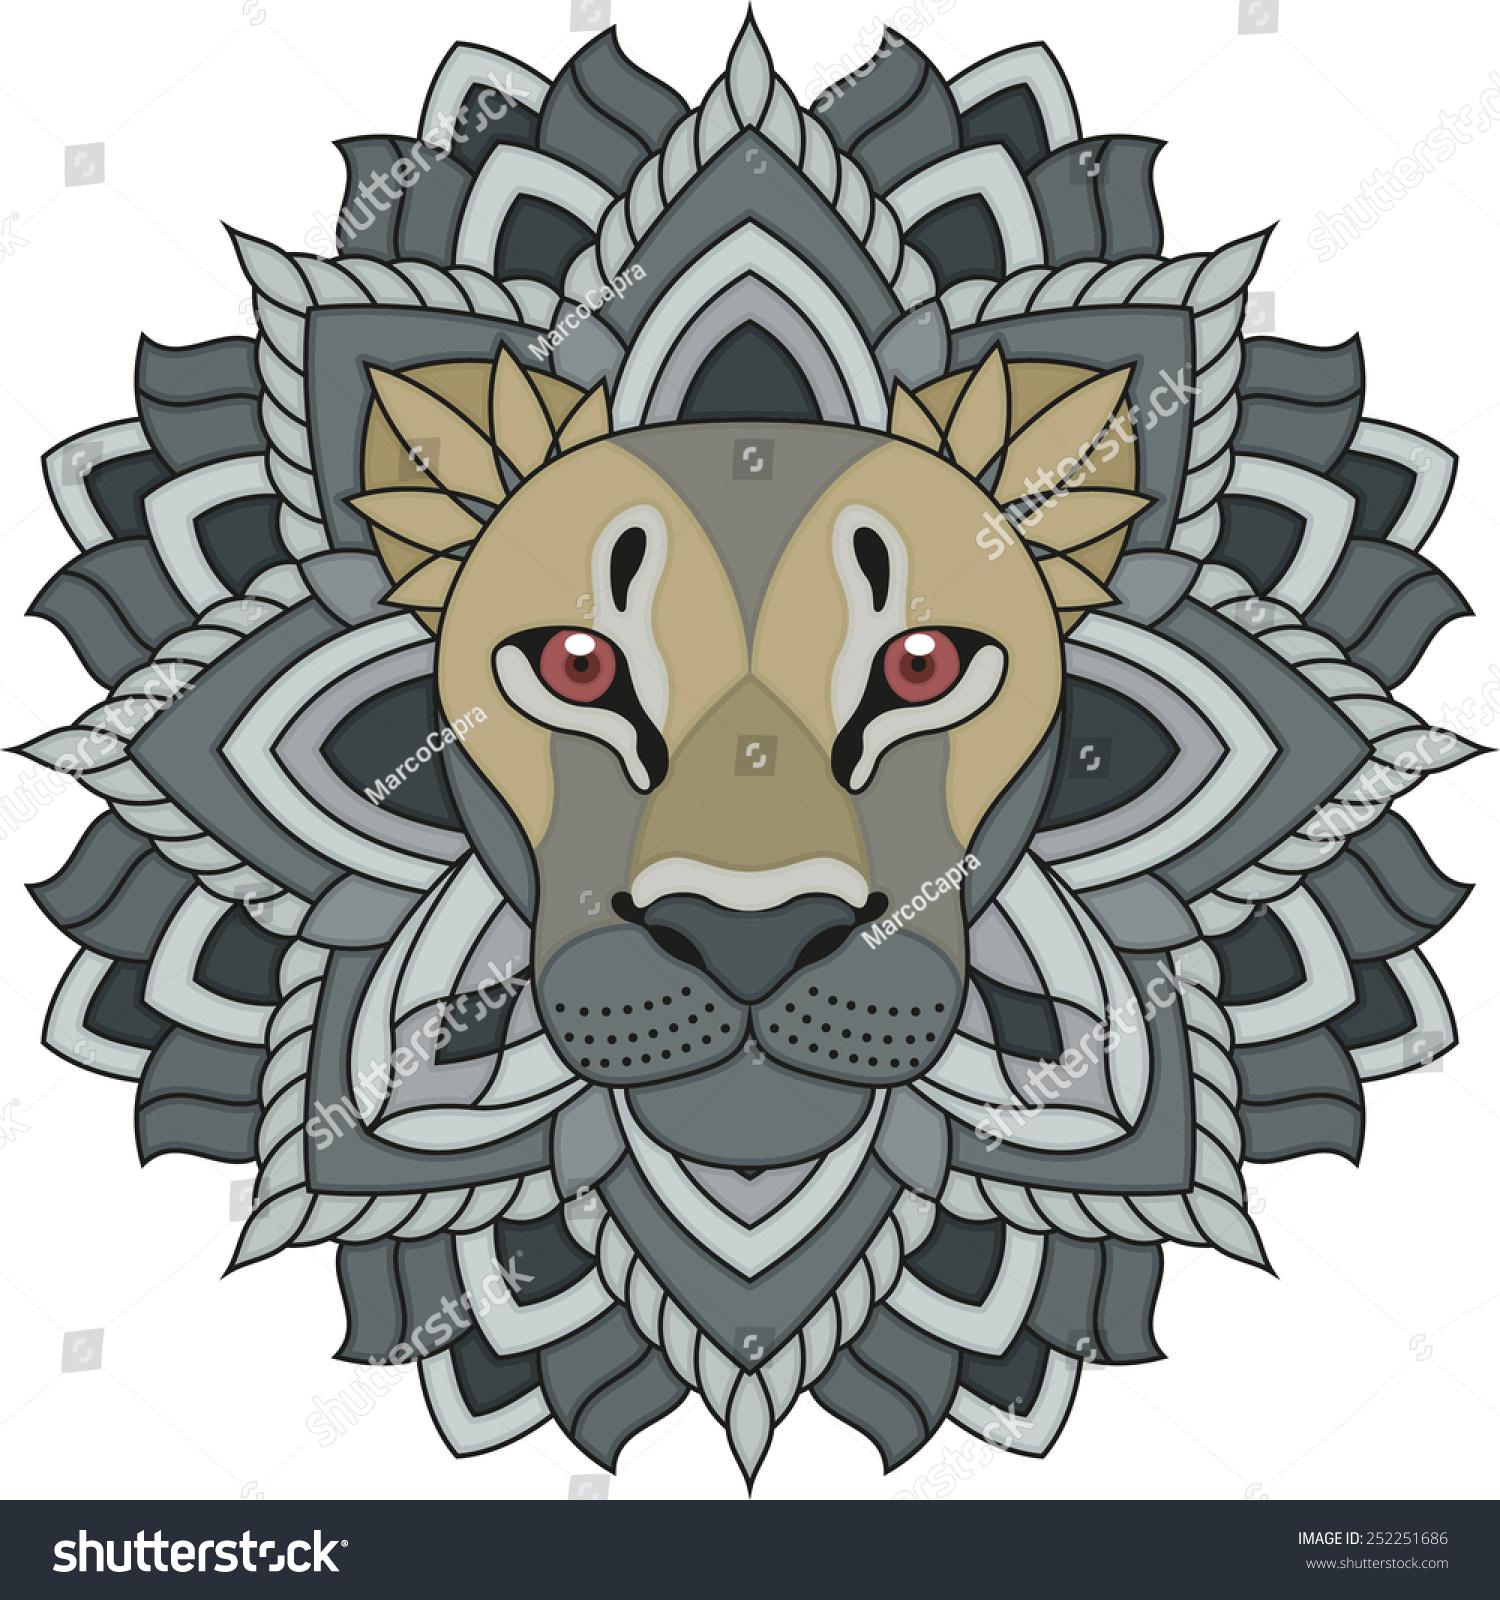 Lion heraldry  Wikipedia